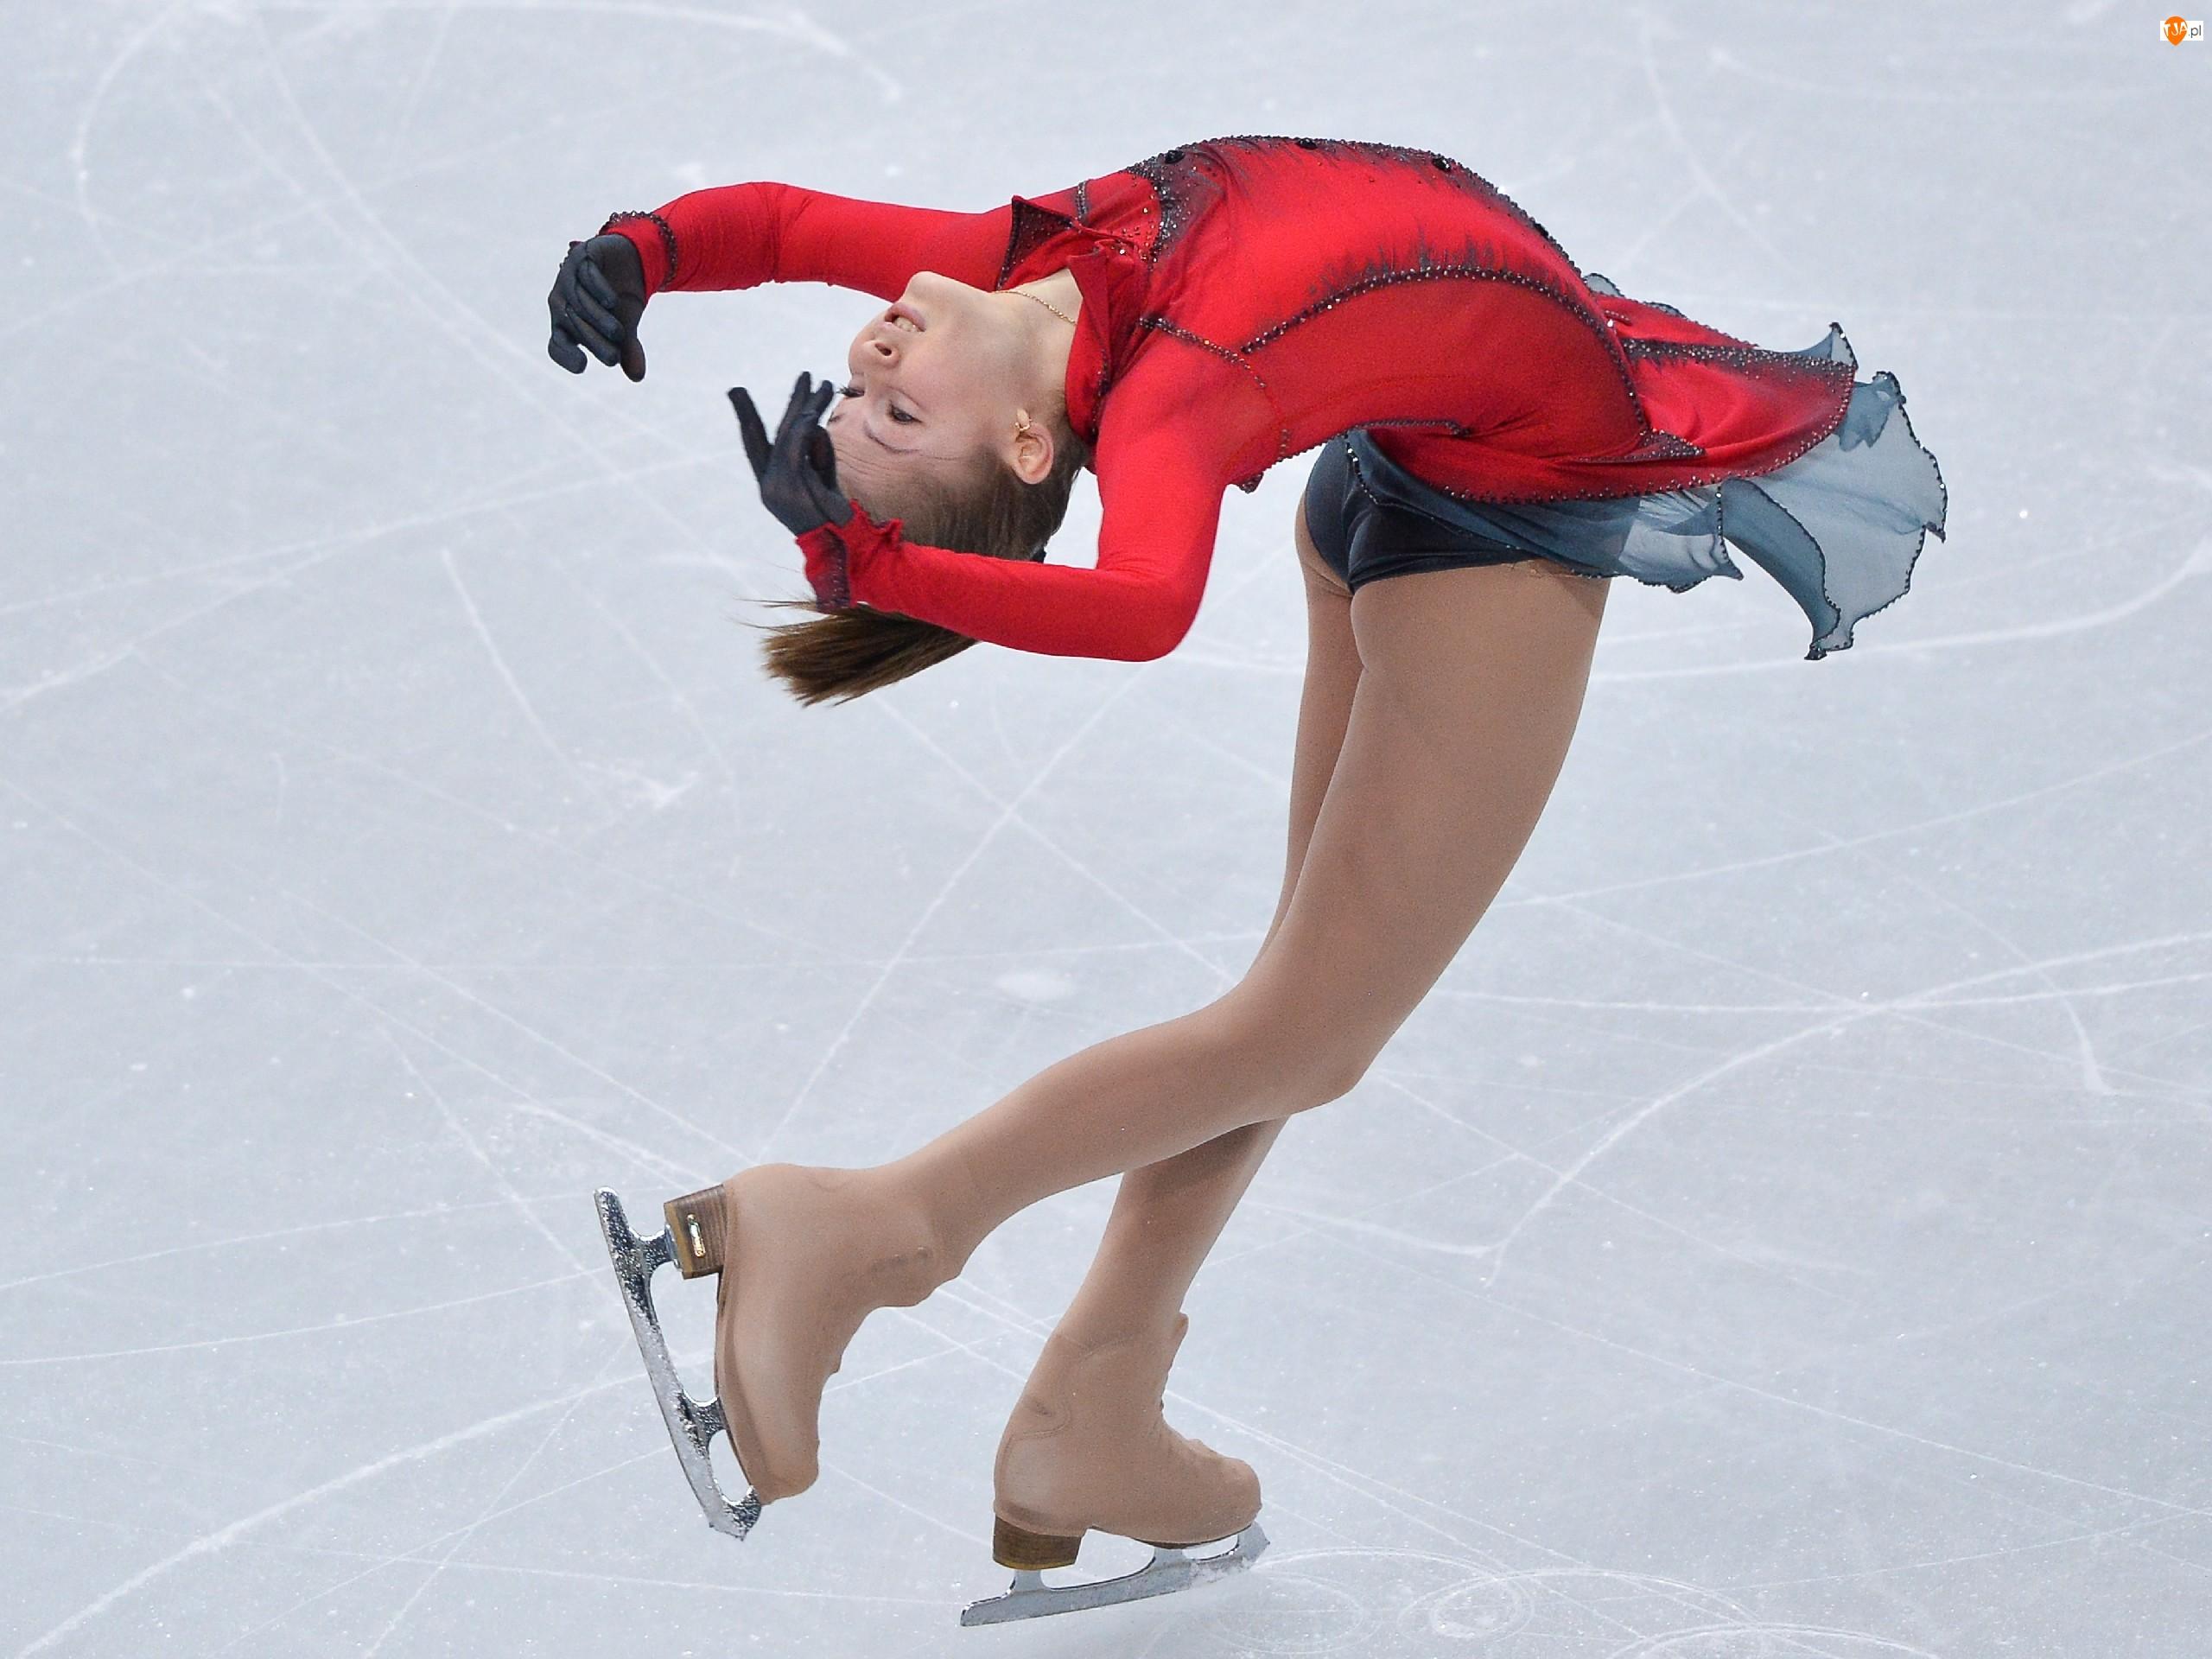 Sochi 2014, Julia Lipnitskaya, Łyżwiarka